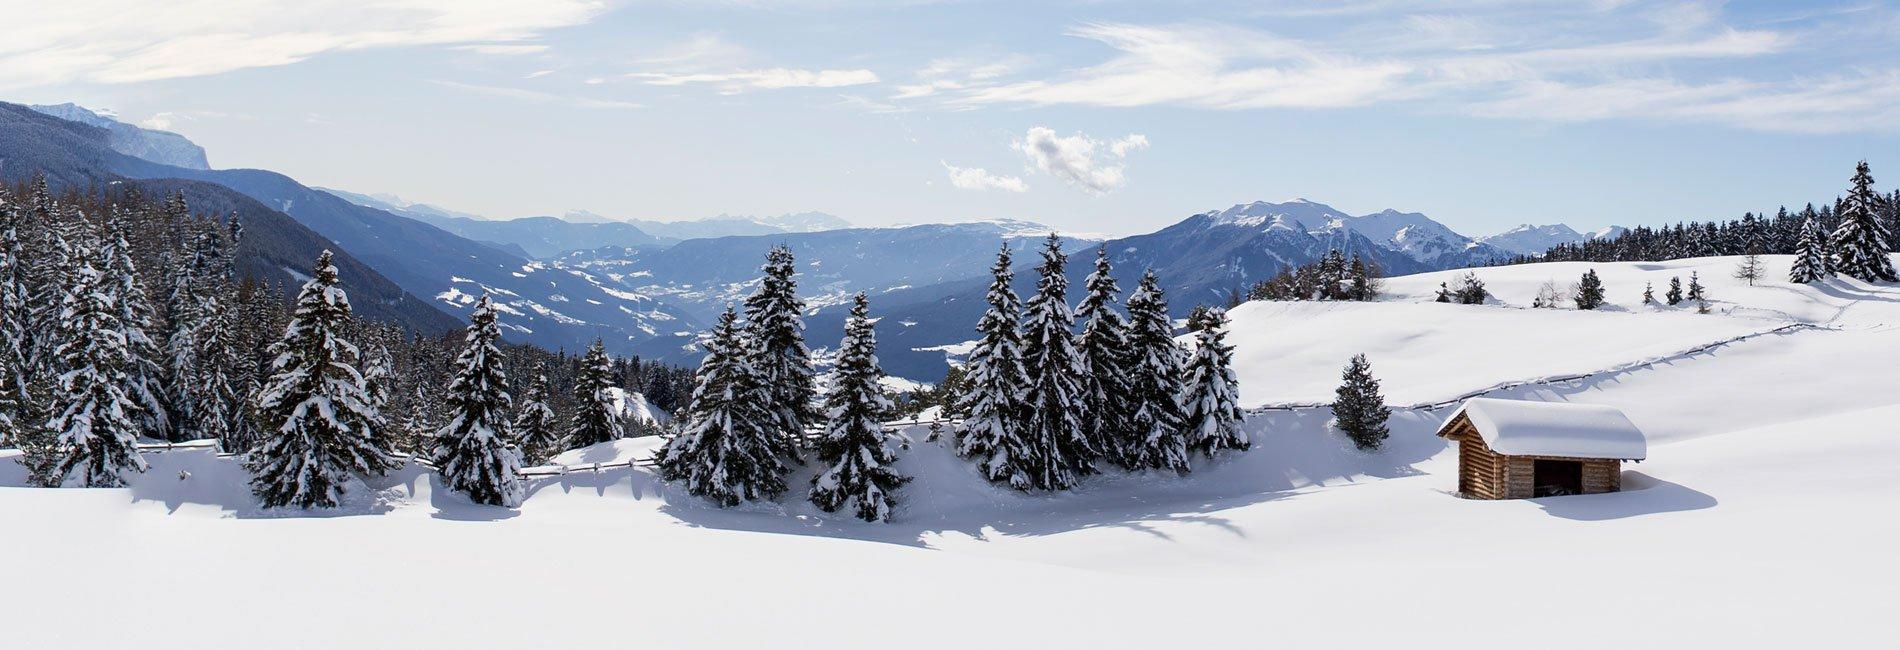 skiurlaub-meransen-25